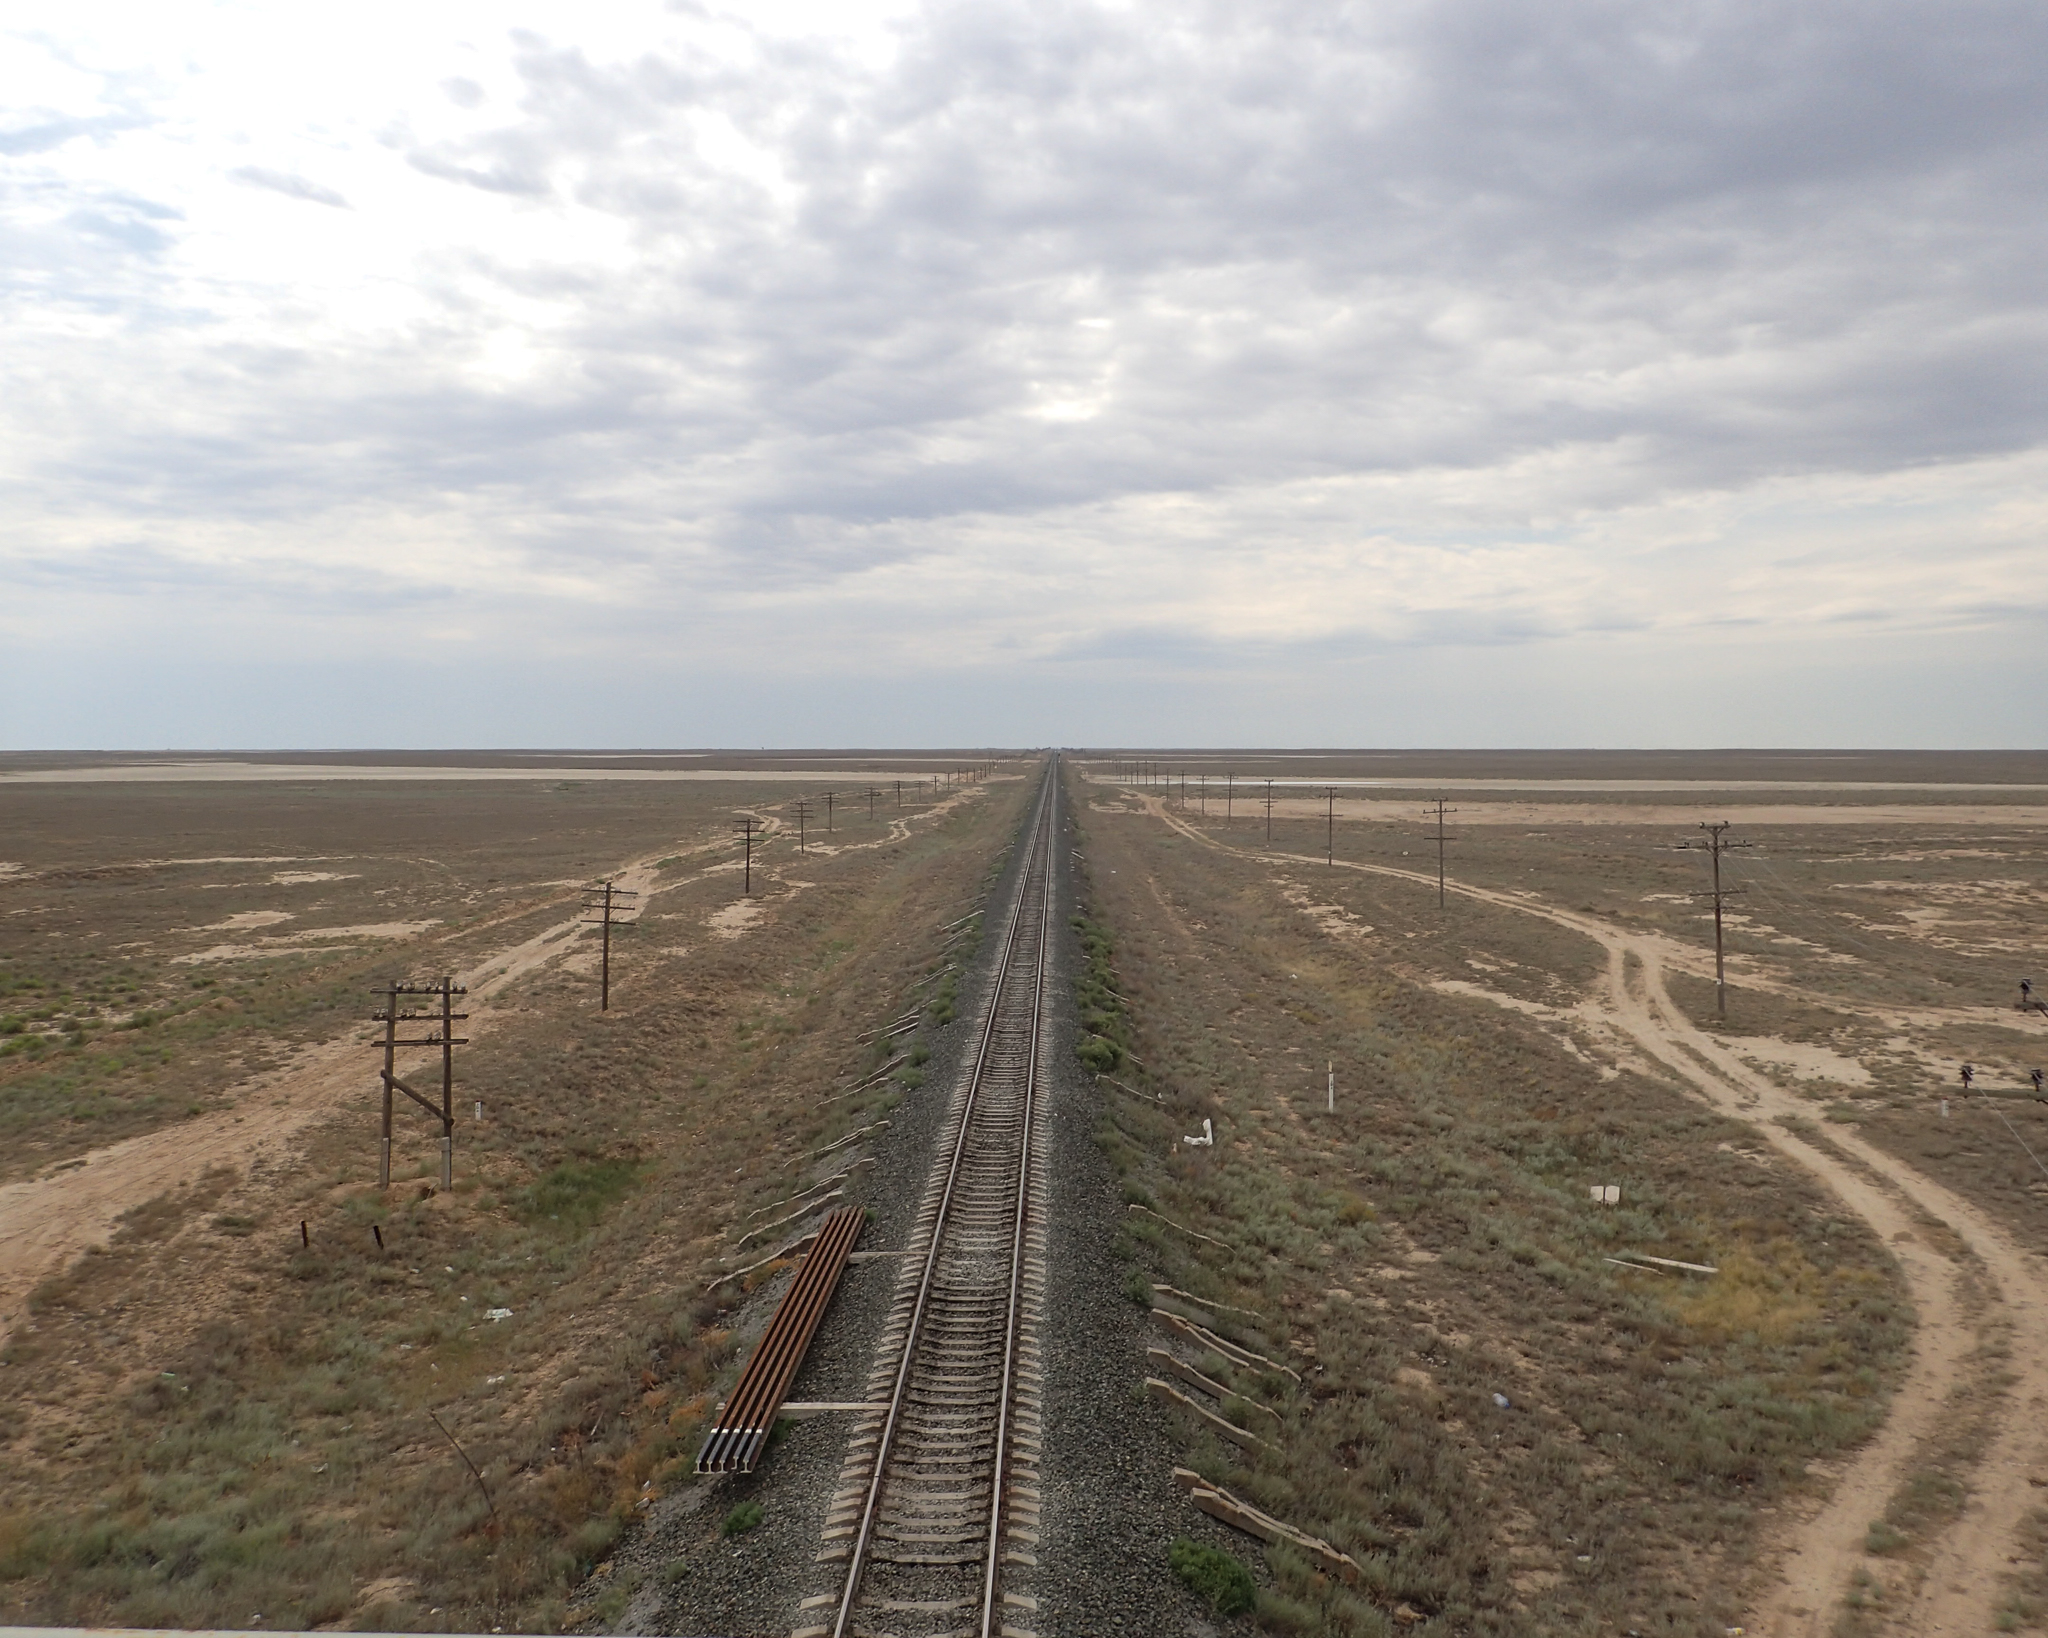 Railway tracks. Soviet Gauge 5' or 1520mm